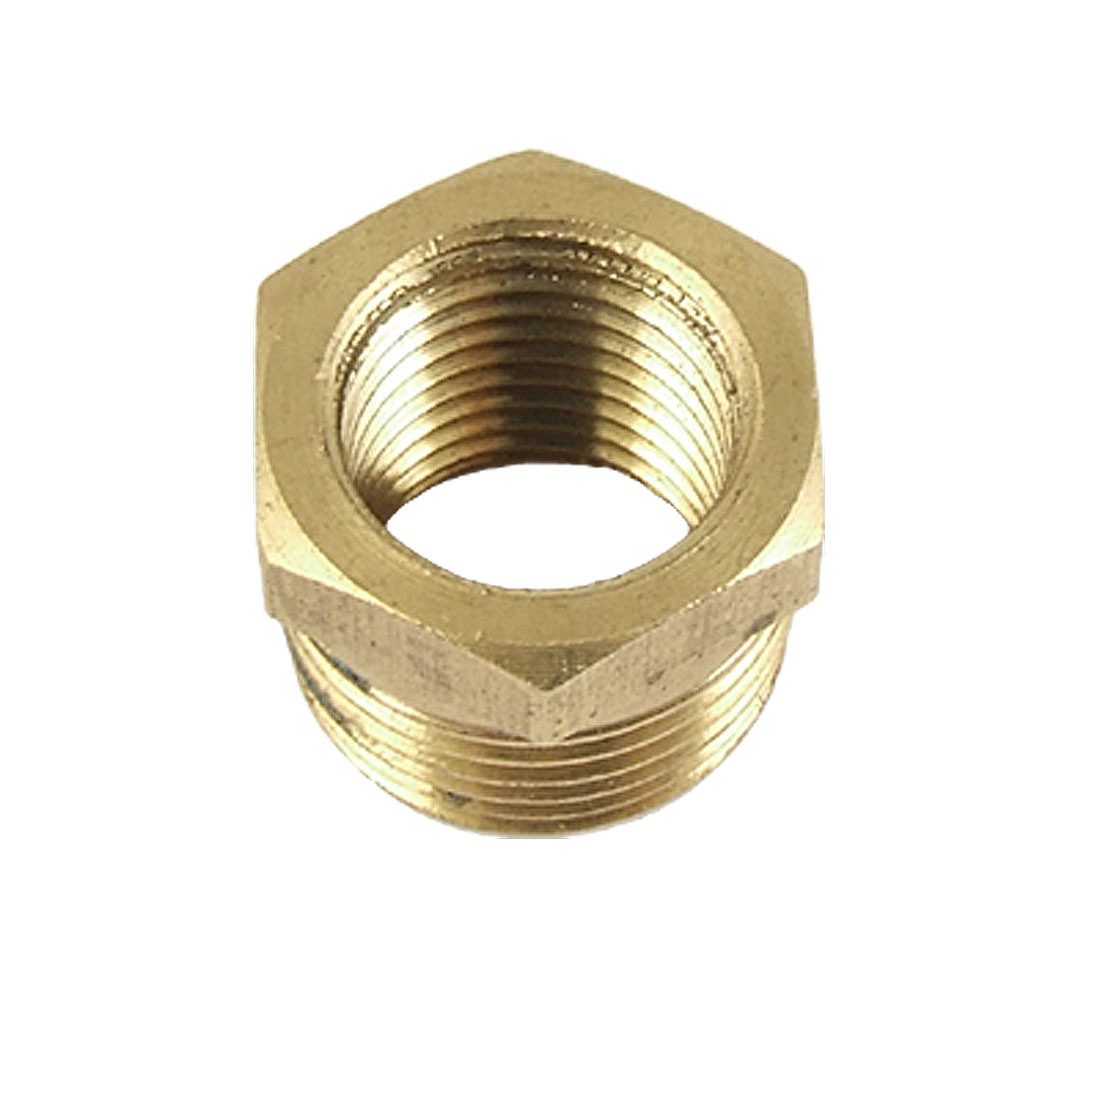 Plumbing Connect Brass M/F Thread Reducing Bushing